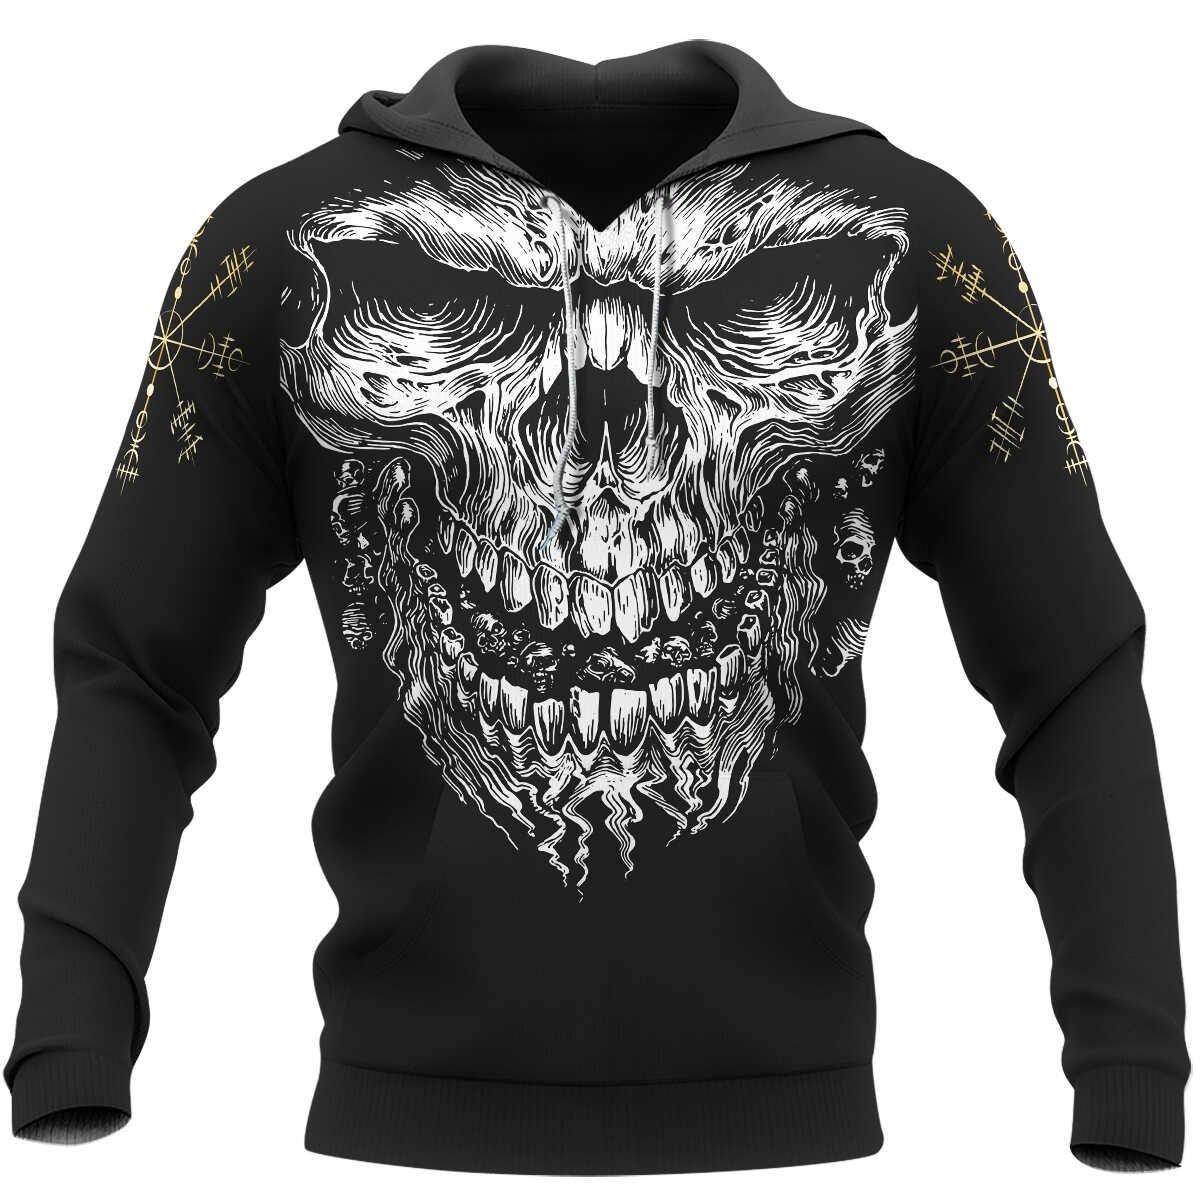 Skull Vegvisir Viking 3D Hoodie and T-shirt